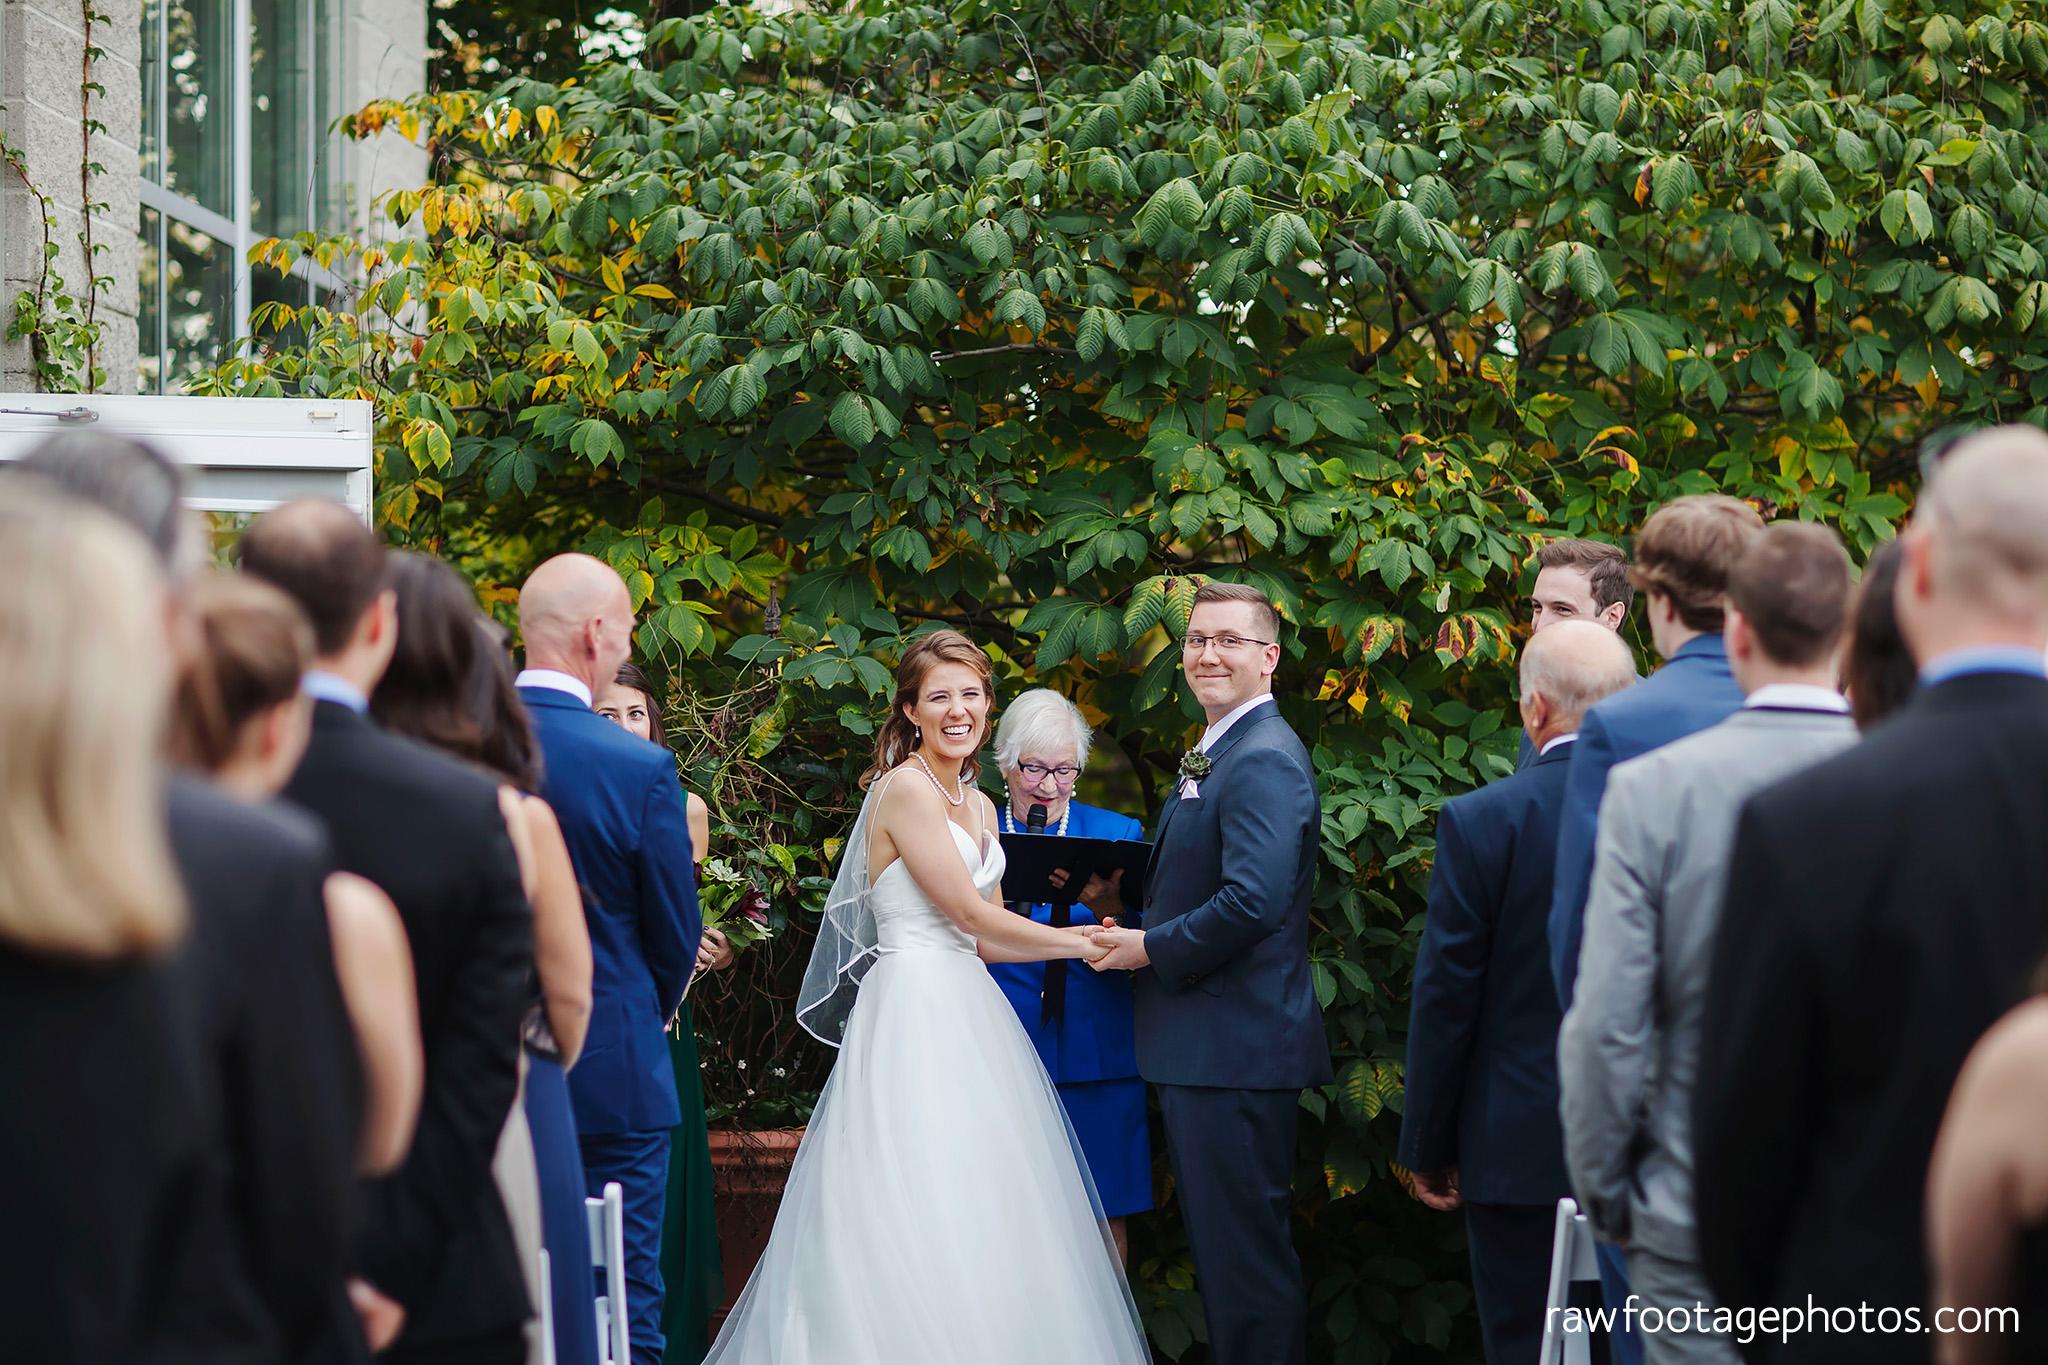 london_ontario_wedding_photographer-civic_gardens-springbank_park-succulent_bouquet-fall_wedding-bridge-raw_footage_photography040.jpg